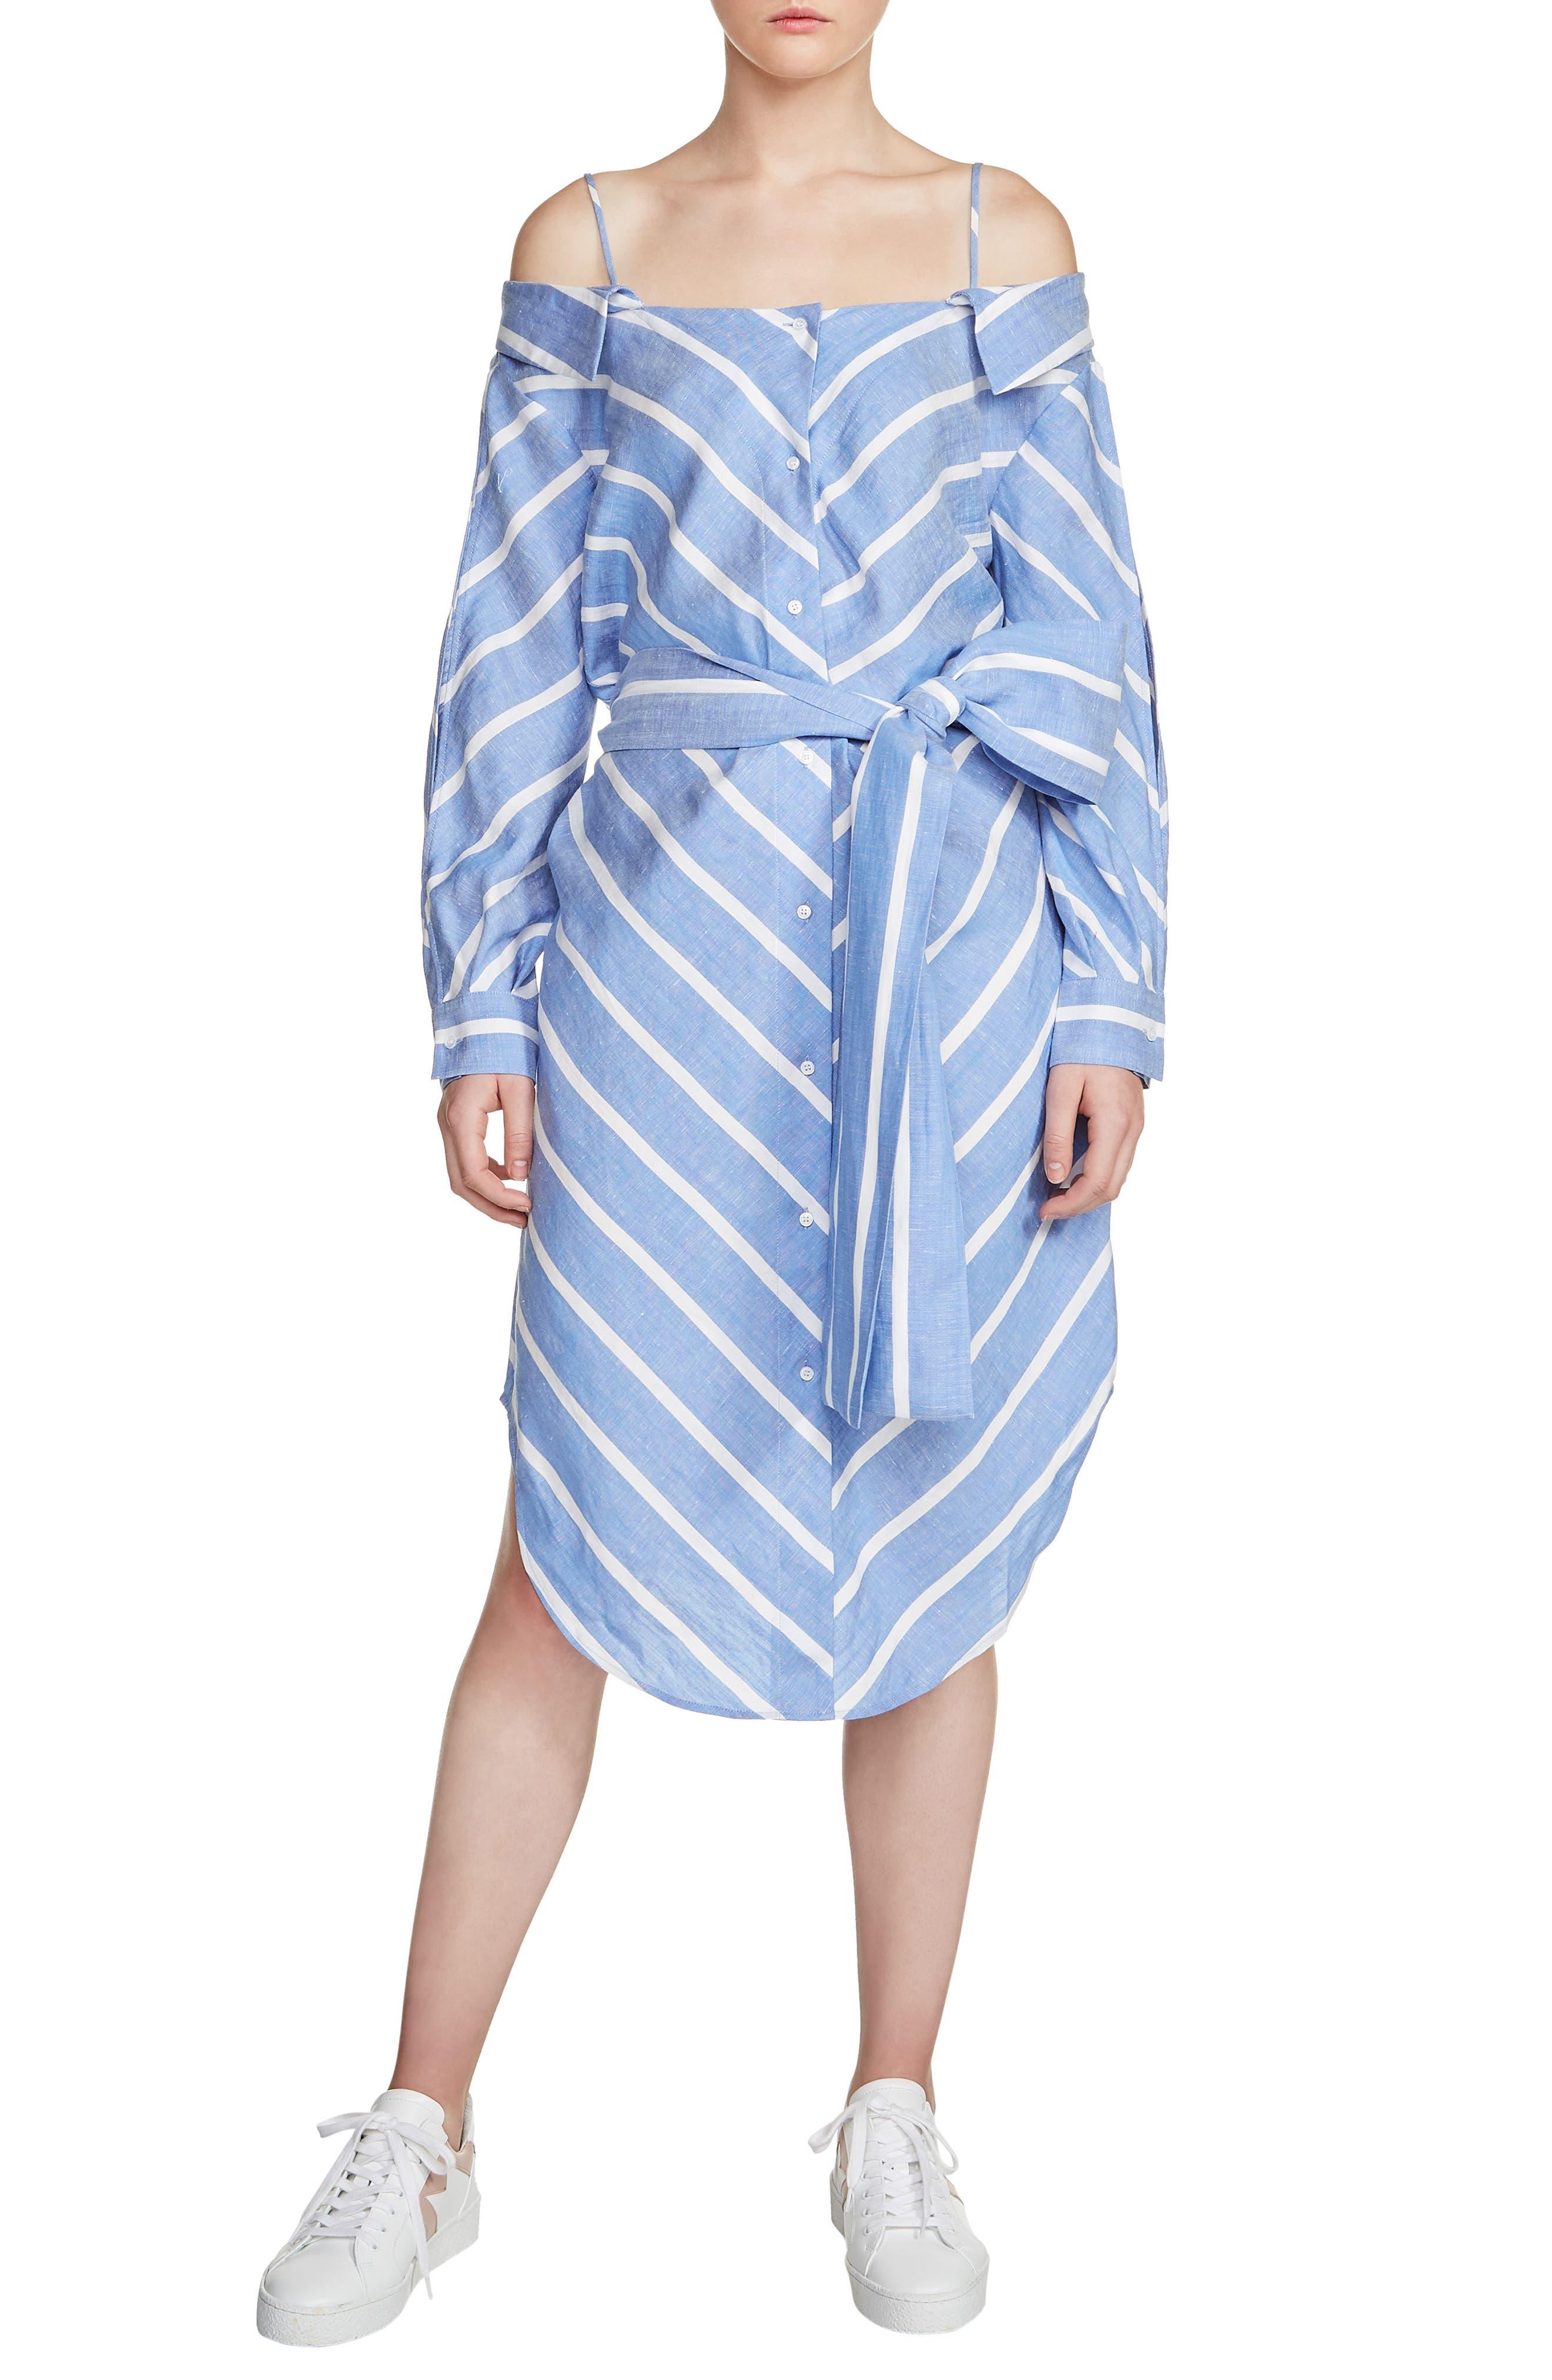 Rulylle Cold Shoulder Shirtdress,                             Main thumbnail 1, color,                             Bleu